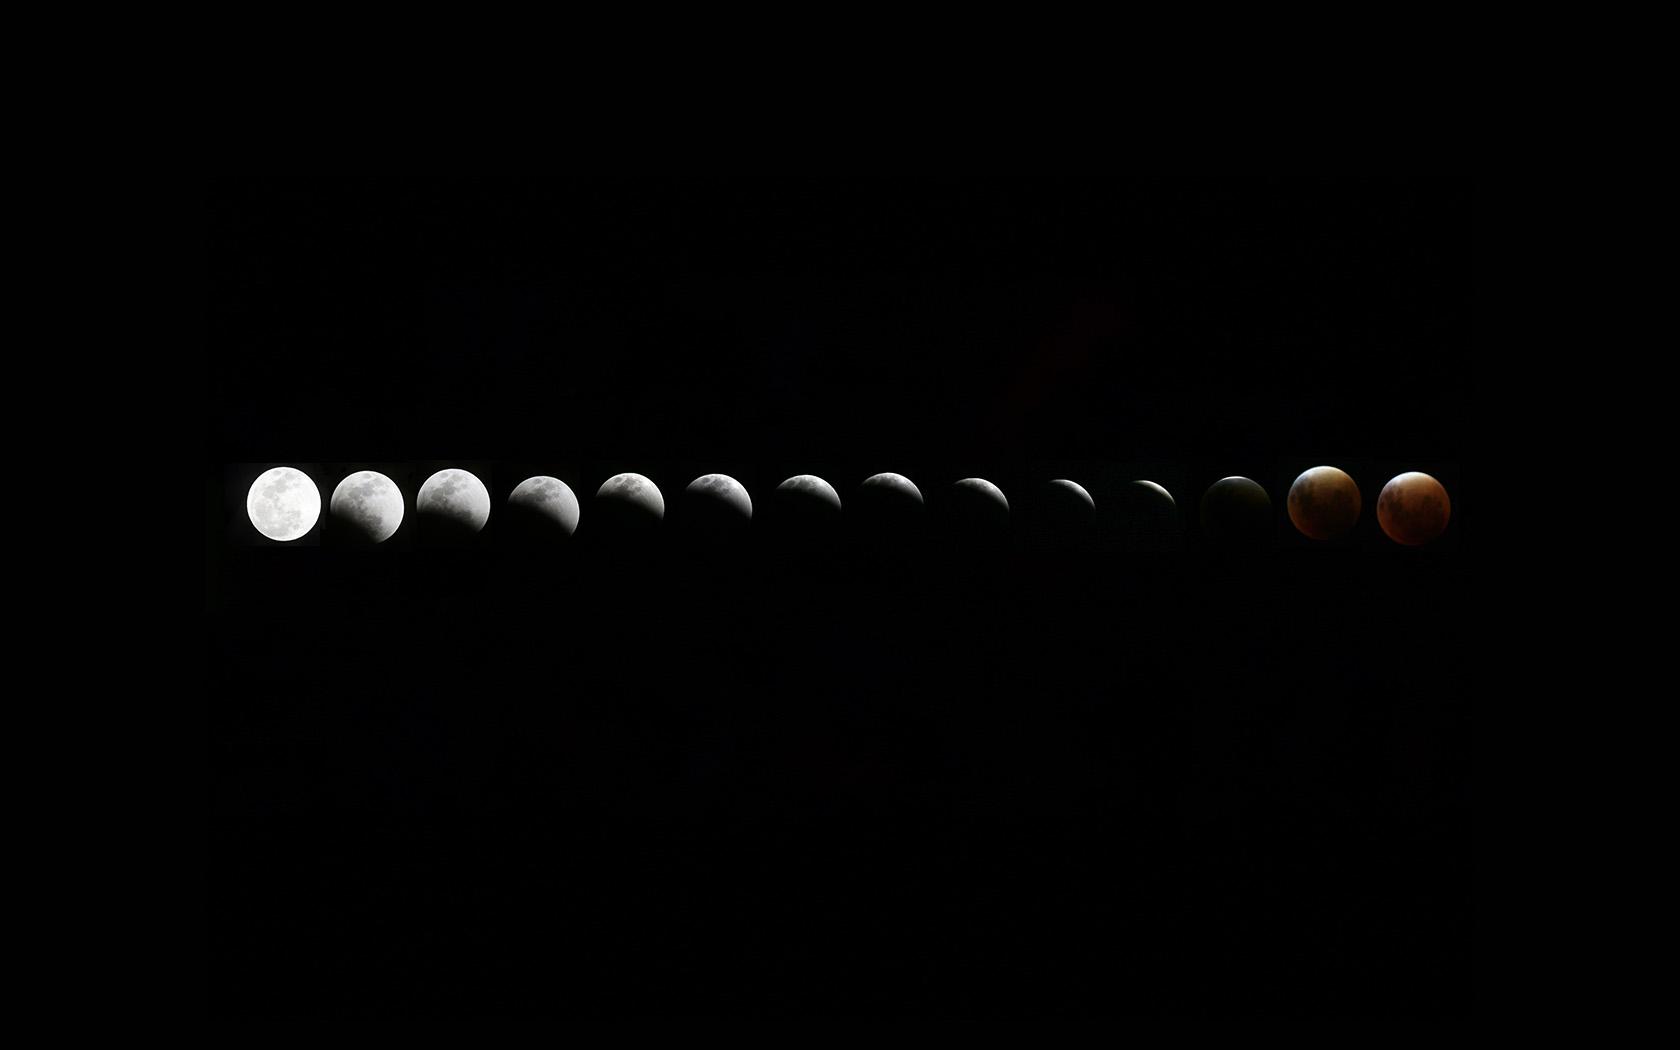 wallpaper for desktop, laptop | nw50-moon-fade-lunar ...